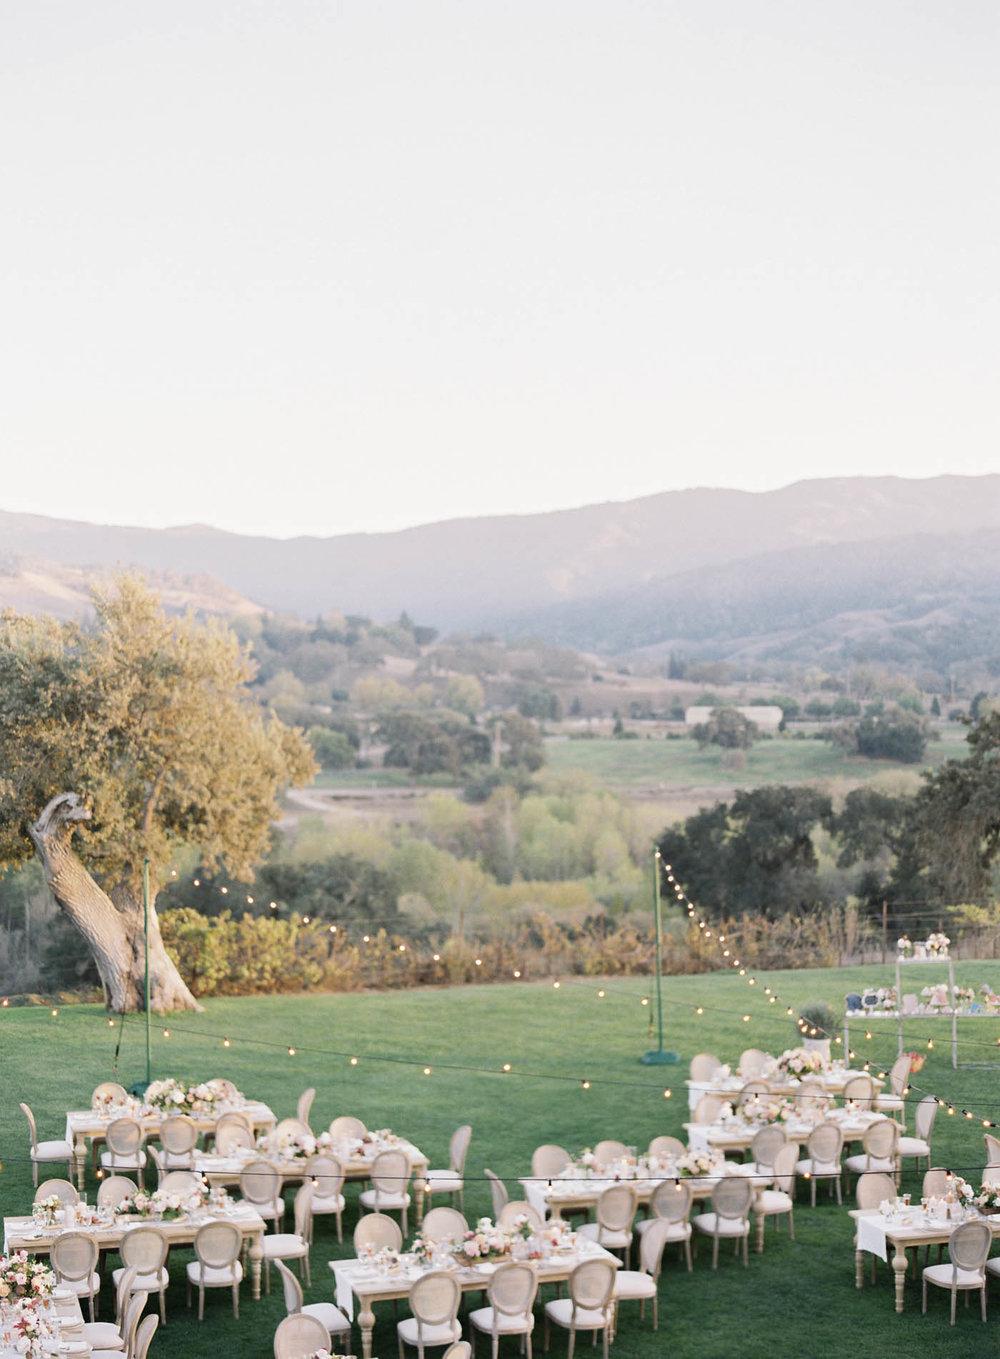 sunstone-villa-wedding-35-Jen_Huang-RD-162-Jen_Huang-009585-R1-015.jpg